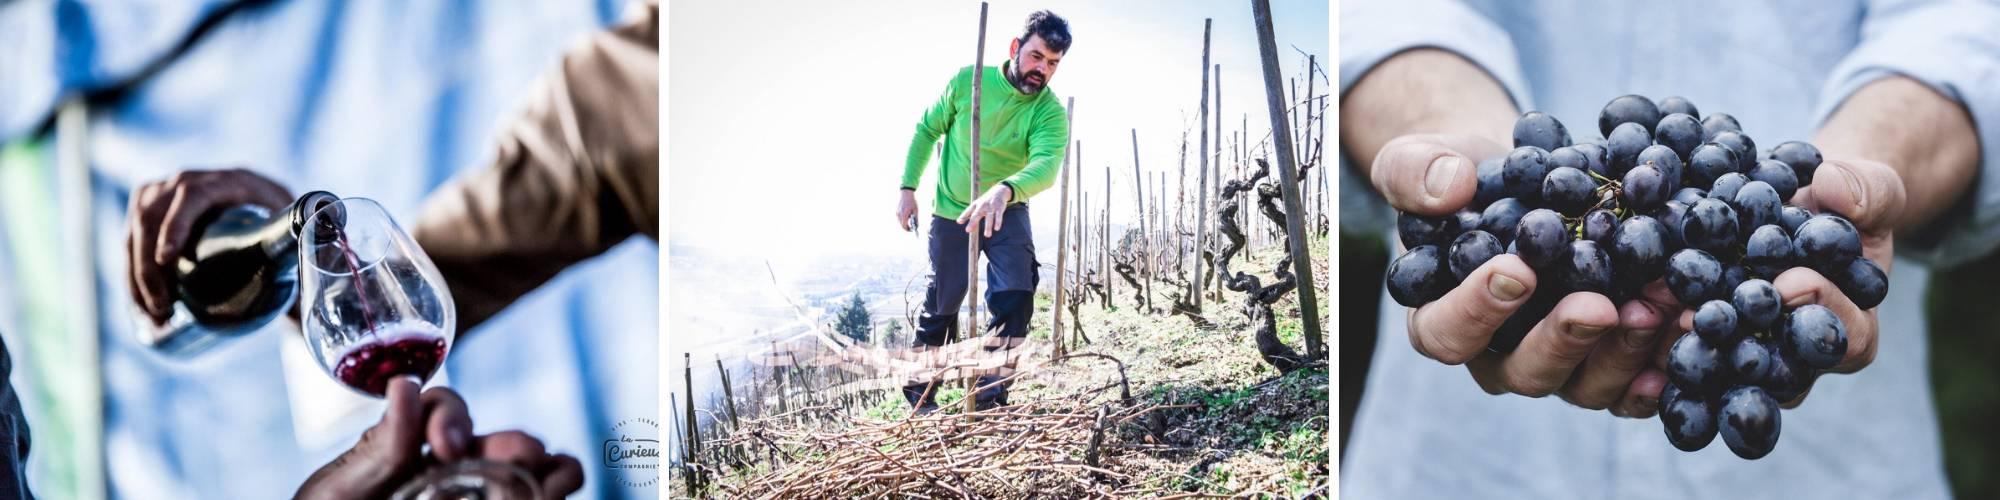 vin naturel en Ardèche Hermitage